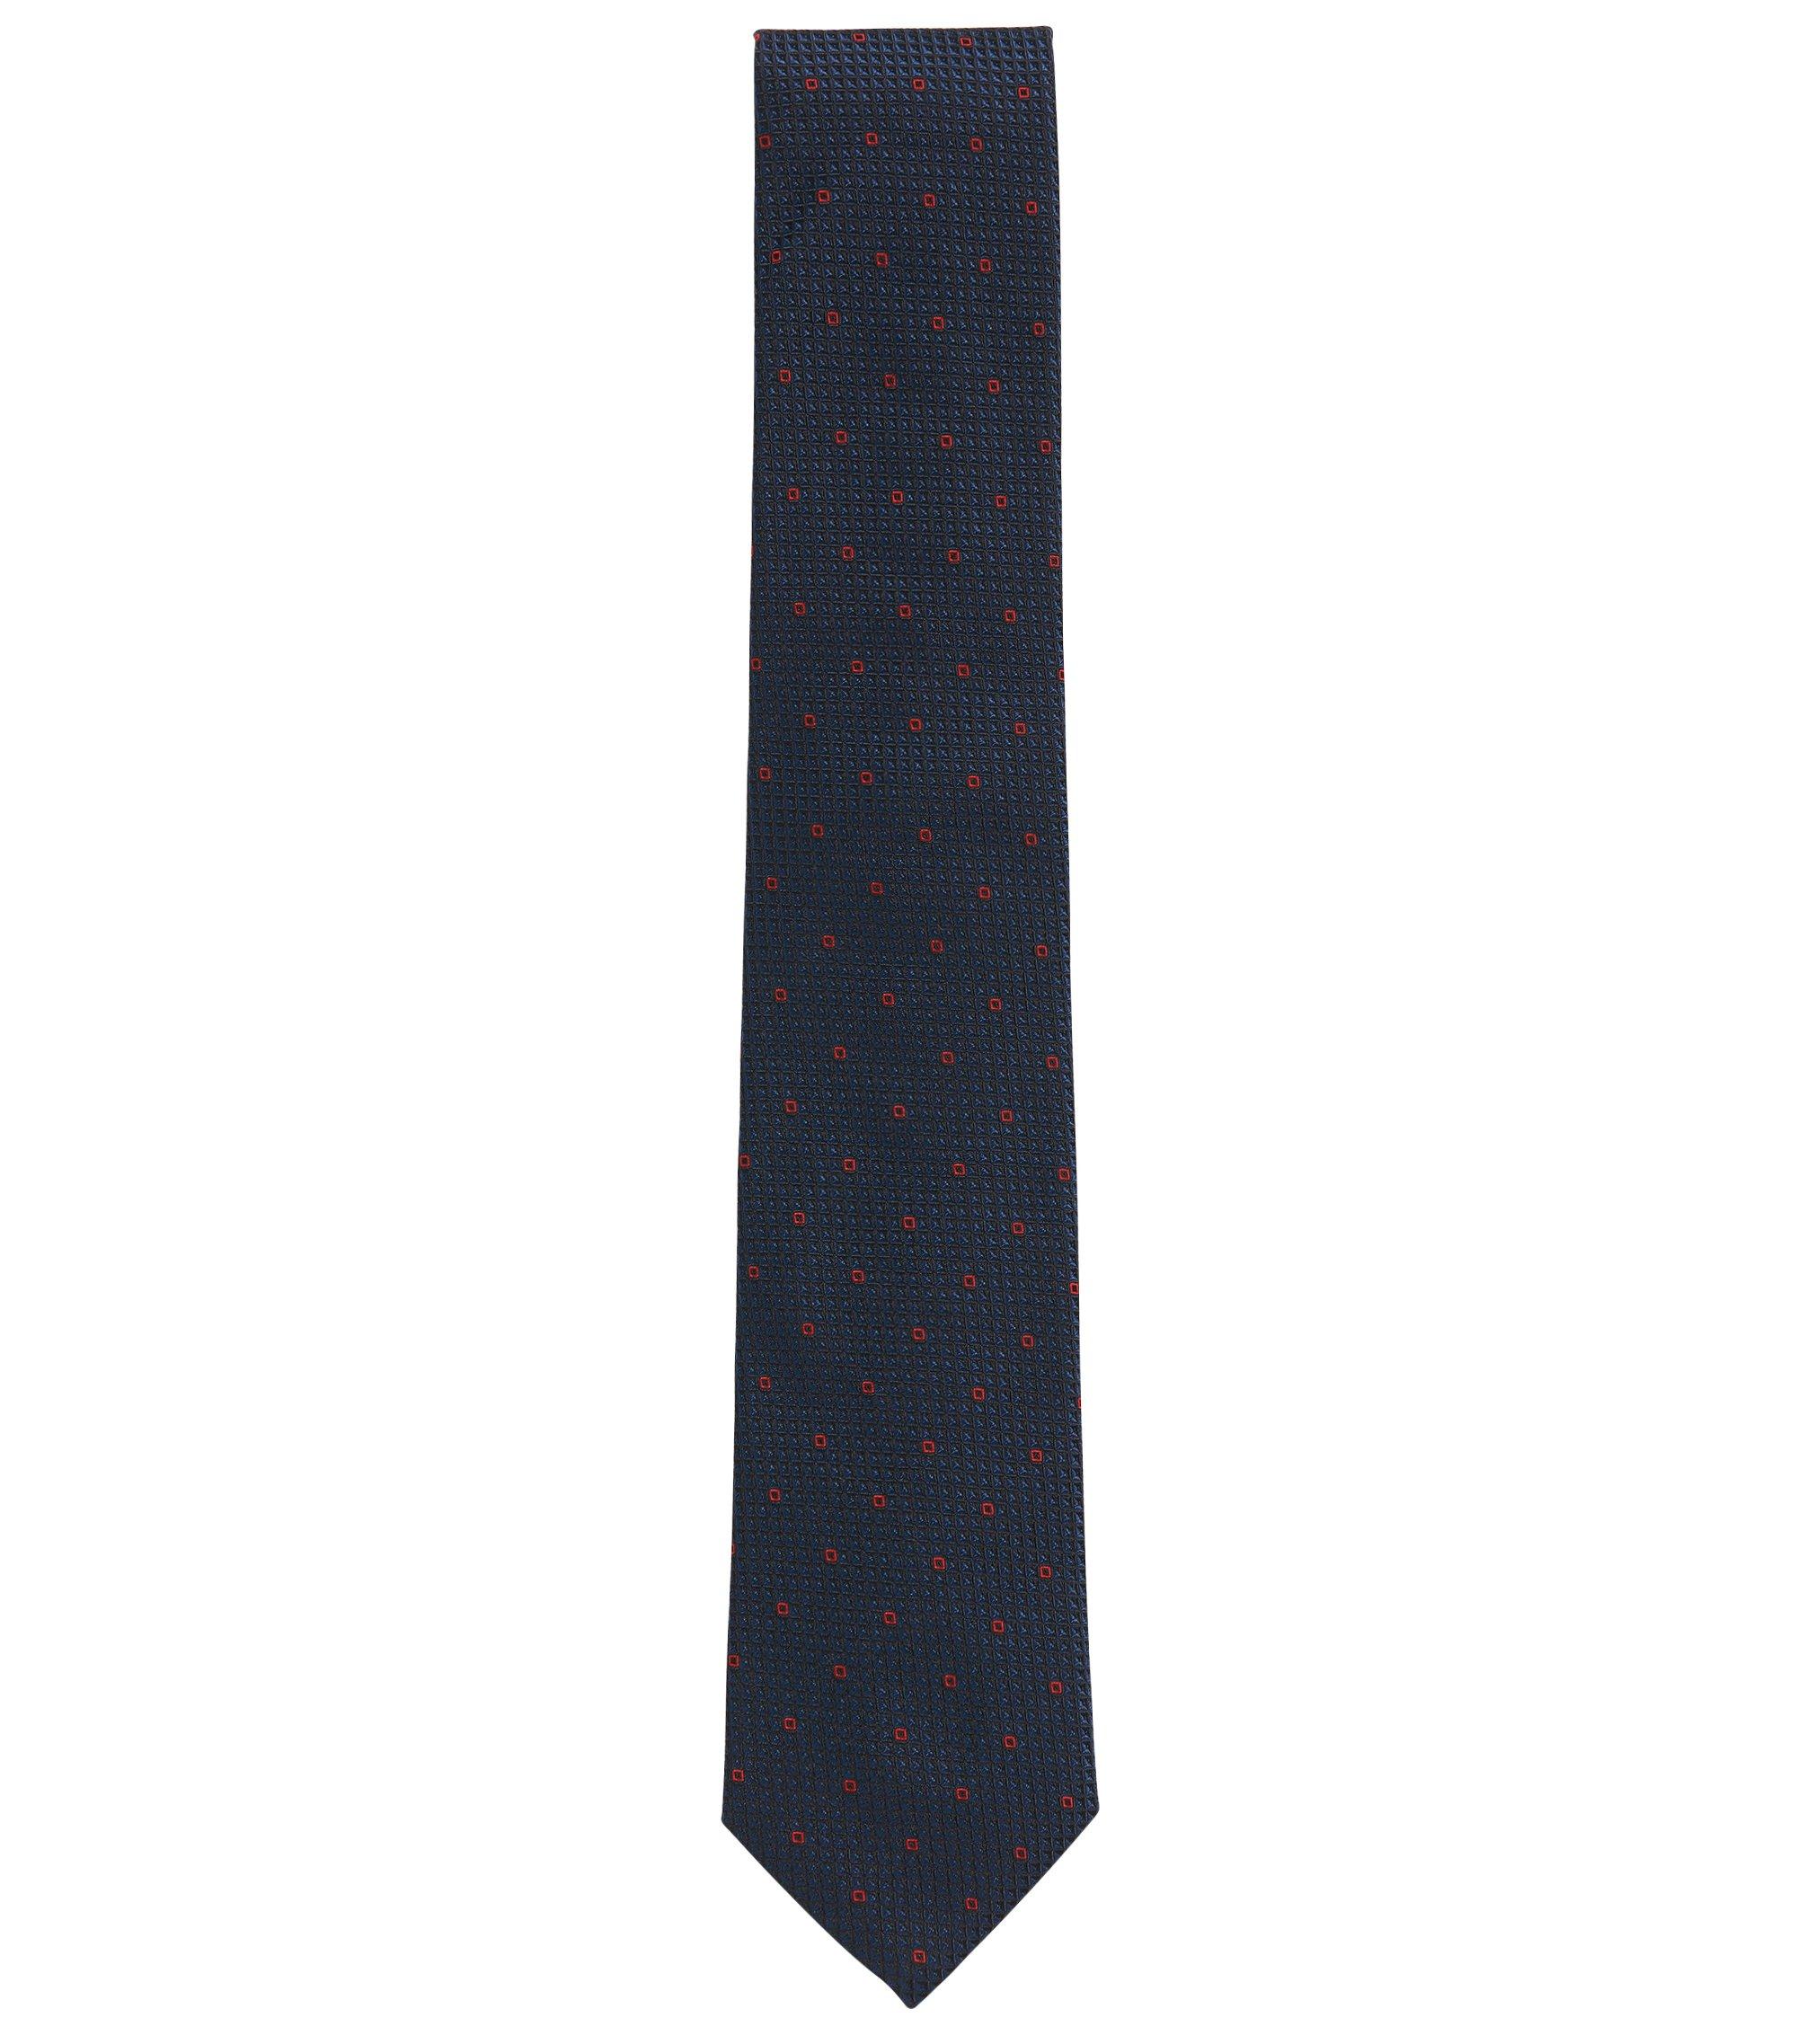 Gemusterte Jacquard-Krawatte aus Seide, Rot